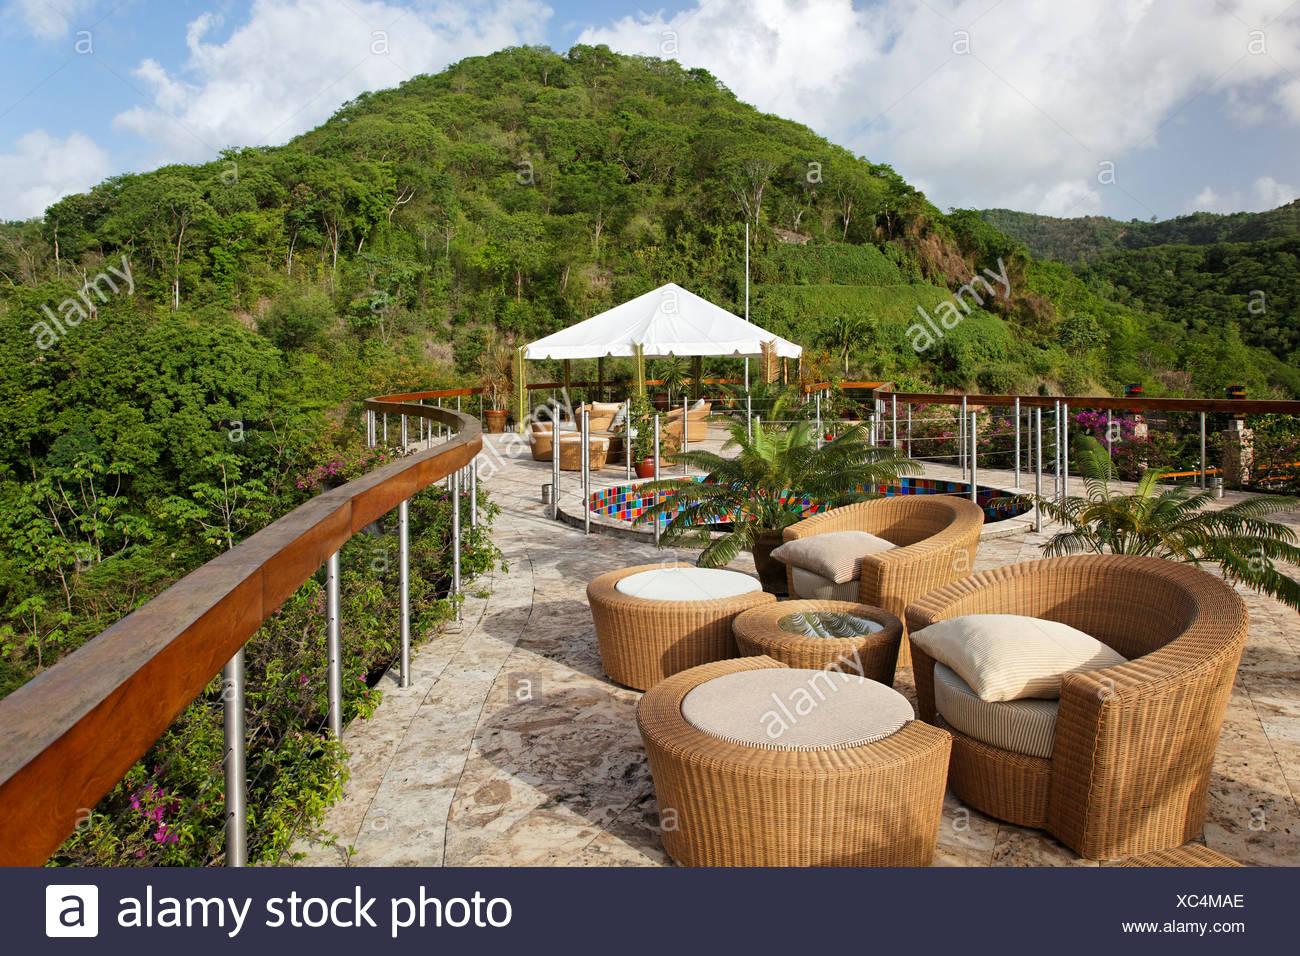 Roof terrace, Dedon, furniture, natural stone floor, hemisphere, rain forrest, unique, Jade Mountain luxury hotel, Saint Lucia - Stock Image